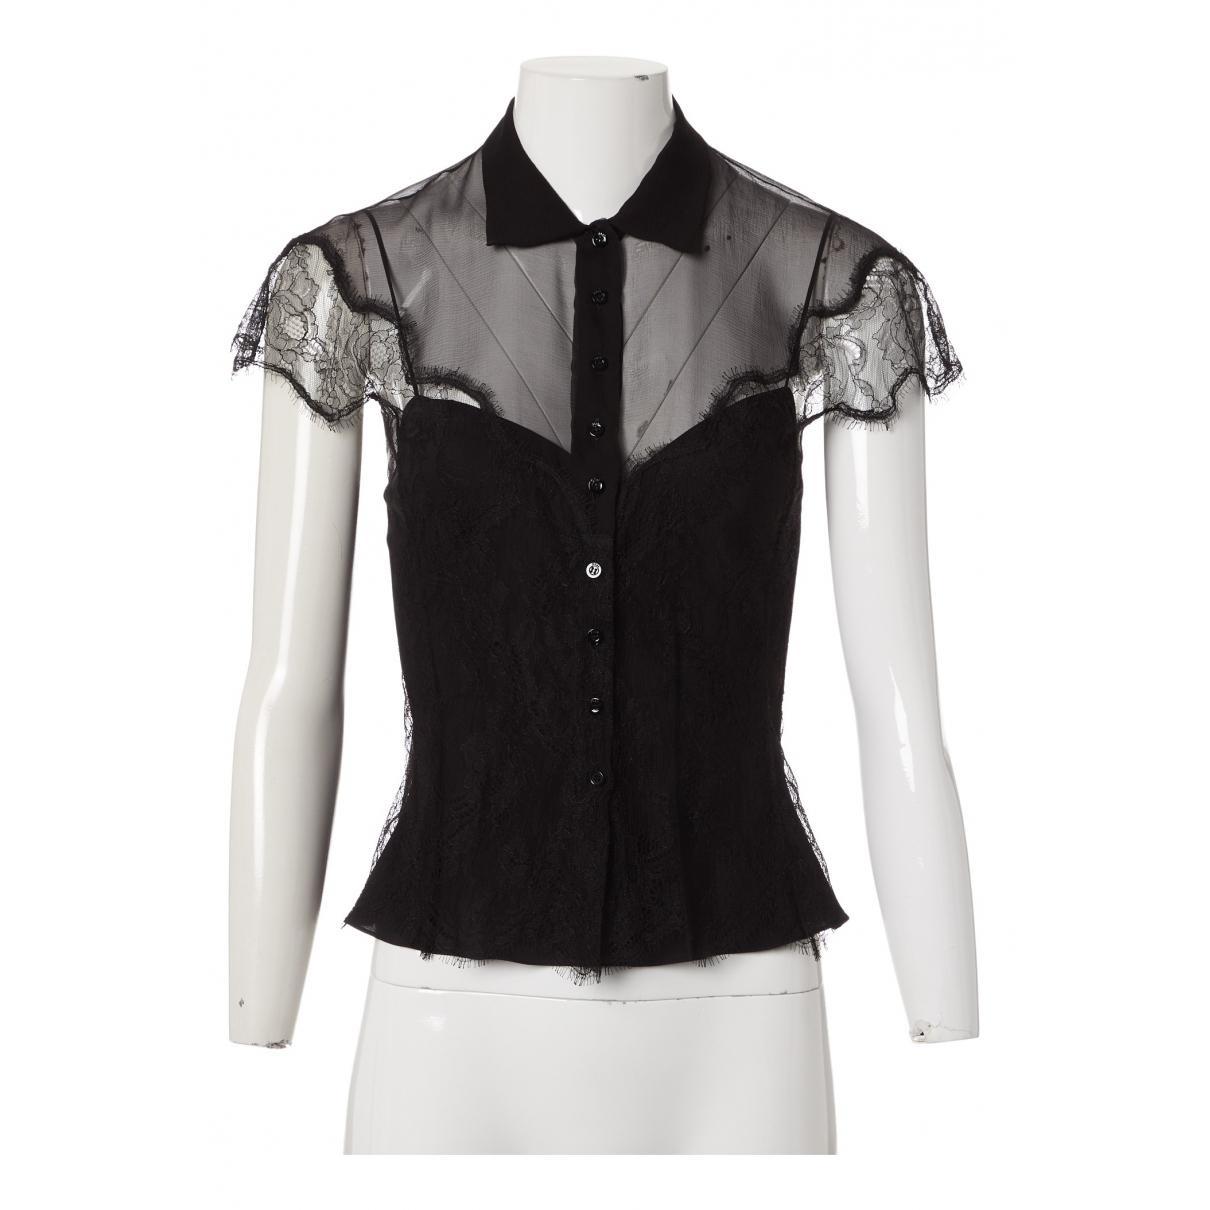 Camiseta de Seda Christian Dior